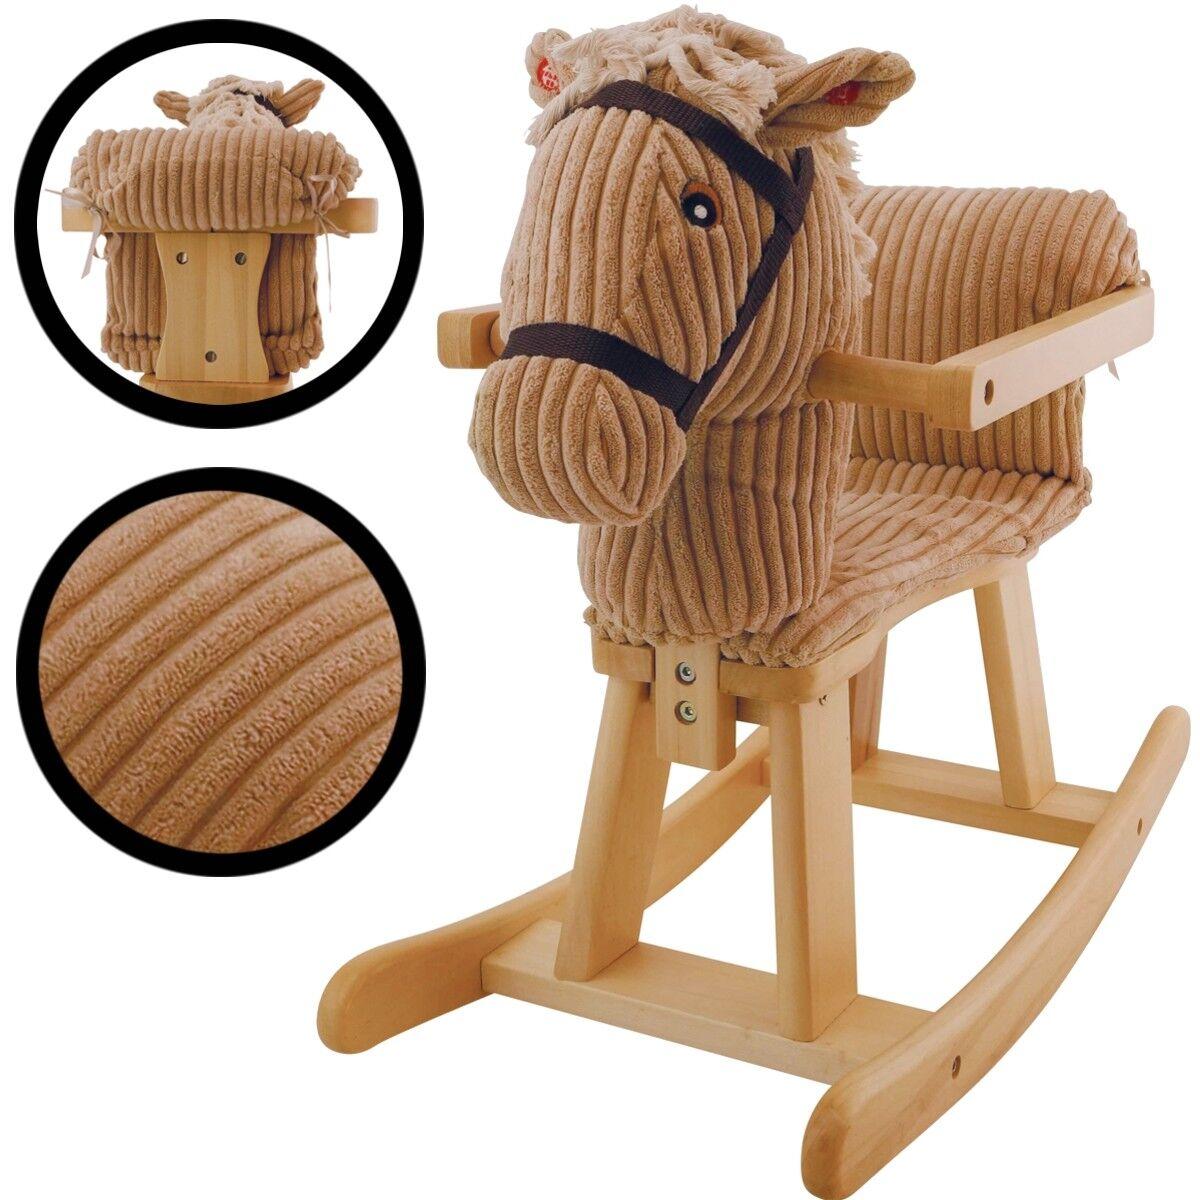 BIECO Holzschaukelpferd aus MASSIVHOLZ MASSIVHOLZ MASSIVHOLZ Schaukeltier Schaukel Pferd Kind Baby 3117ec